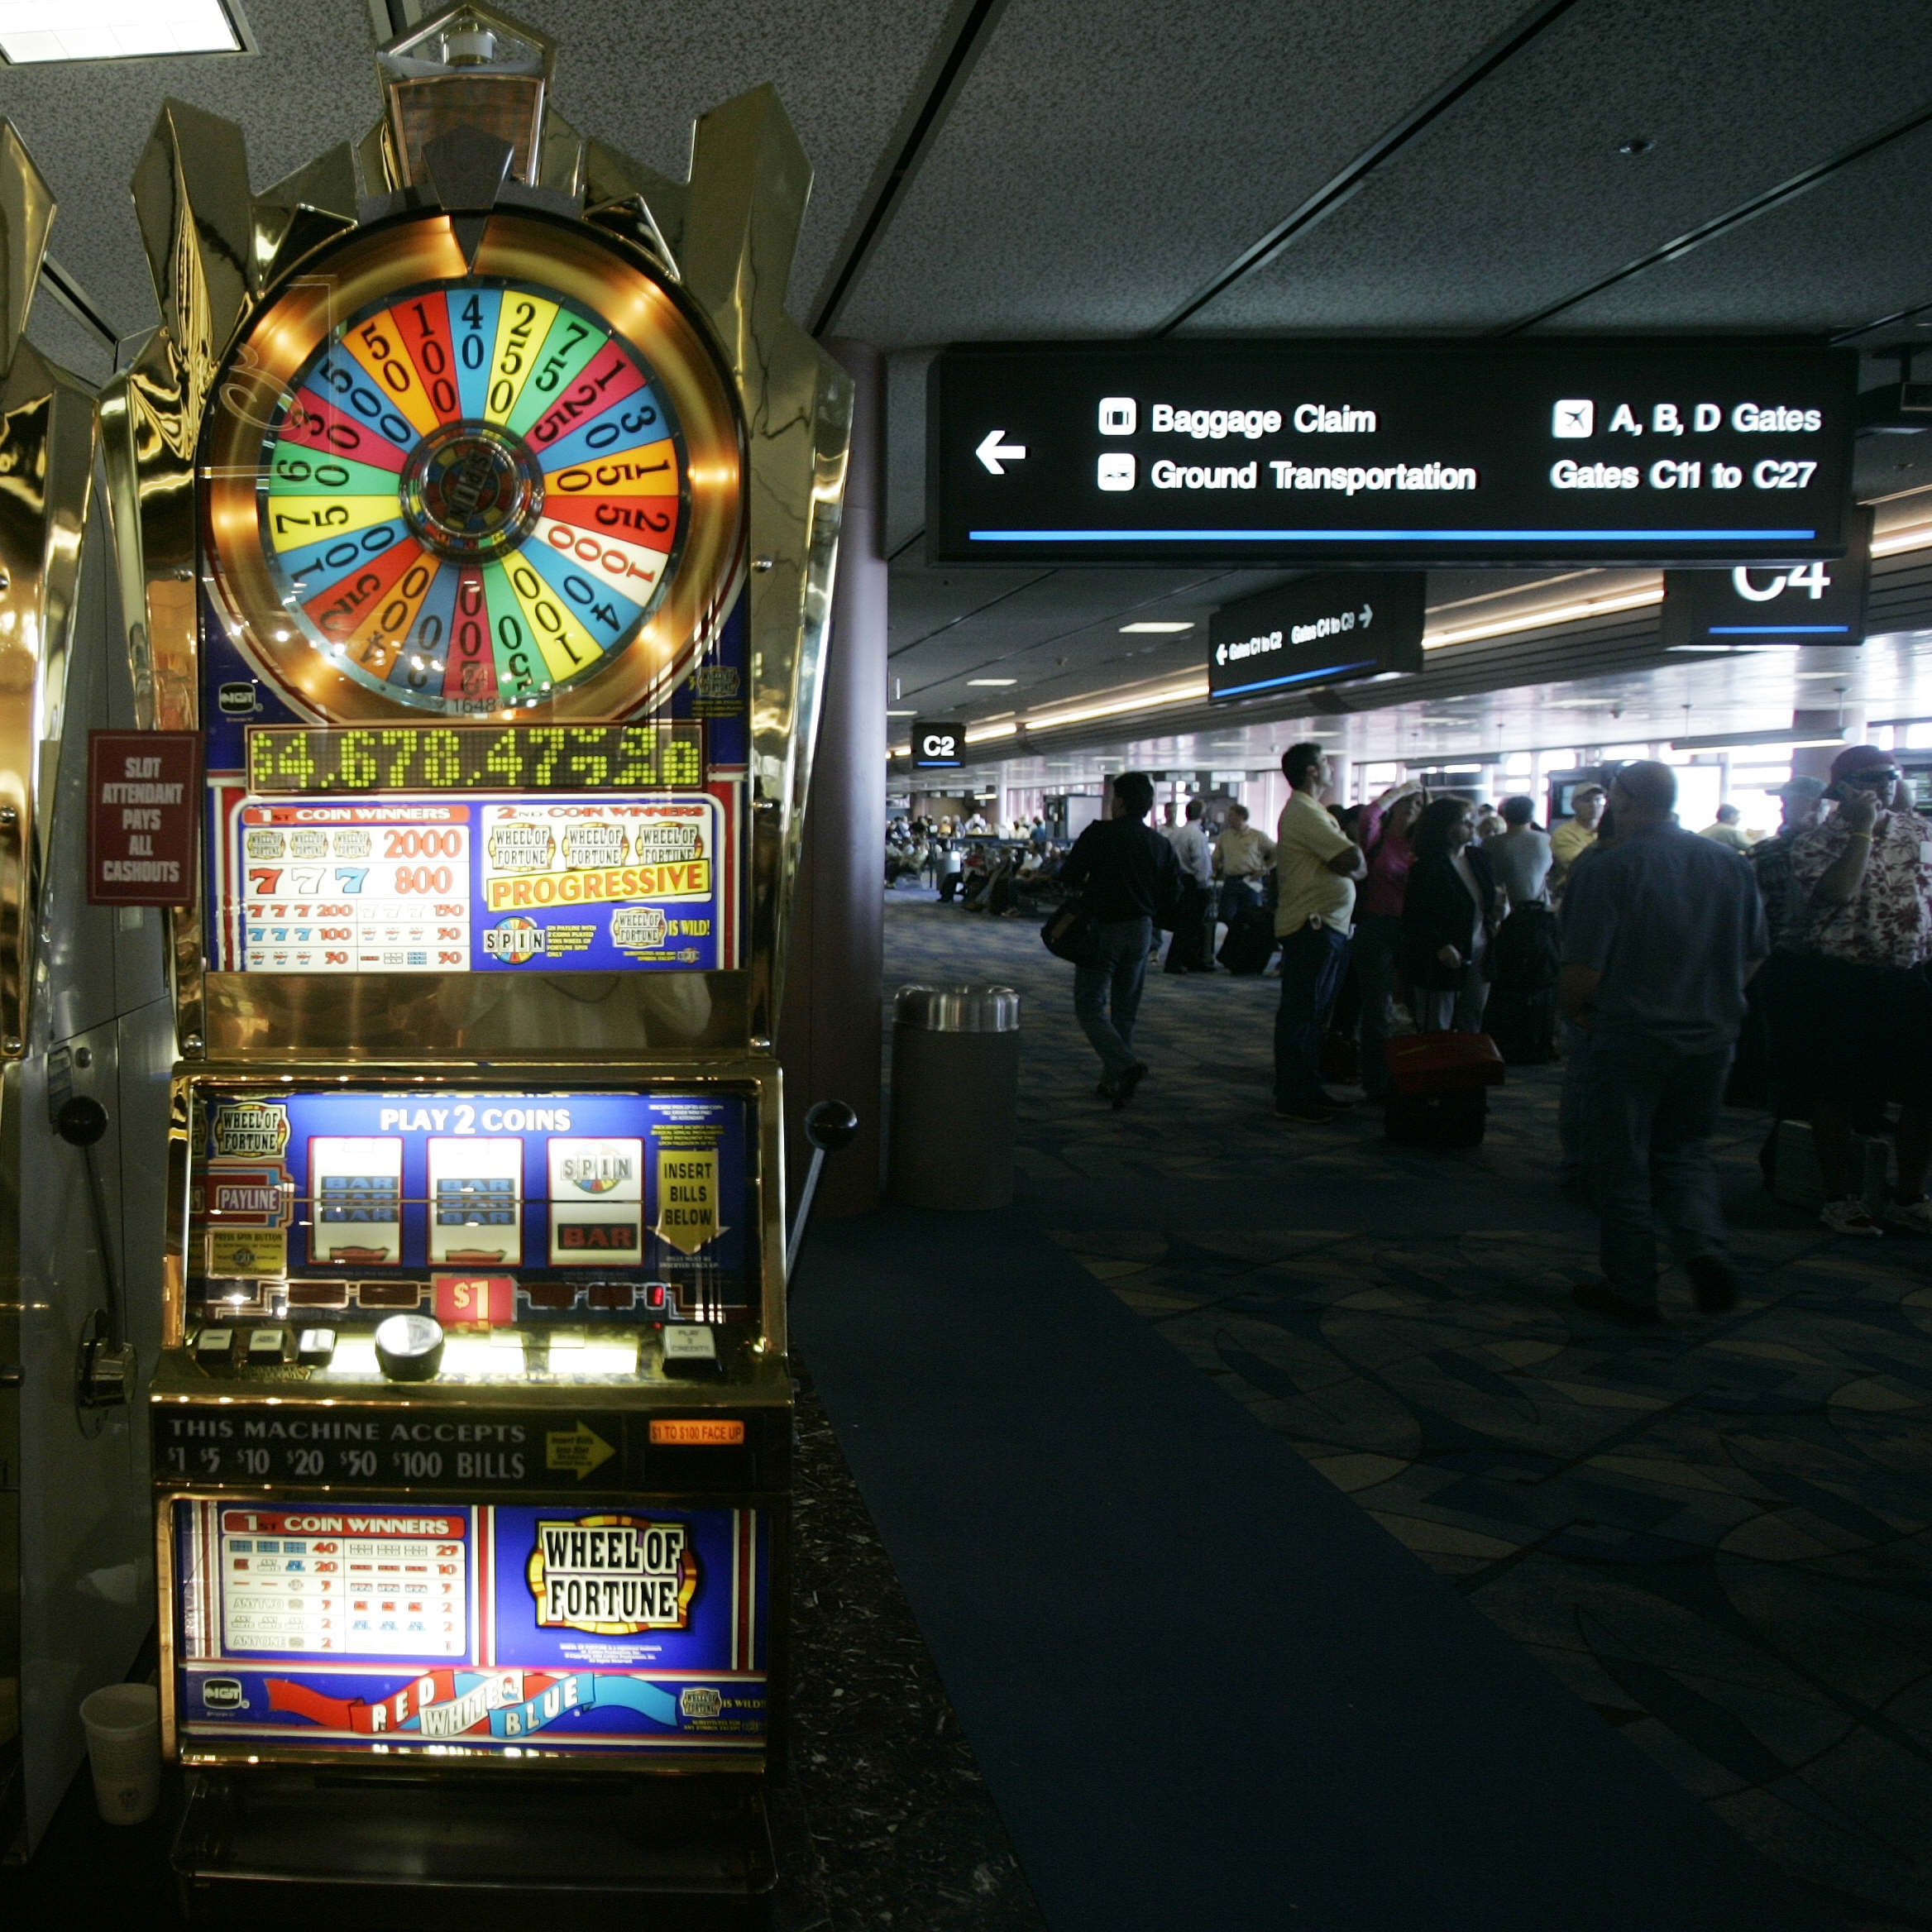 sizzling 7 slot games